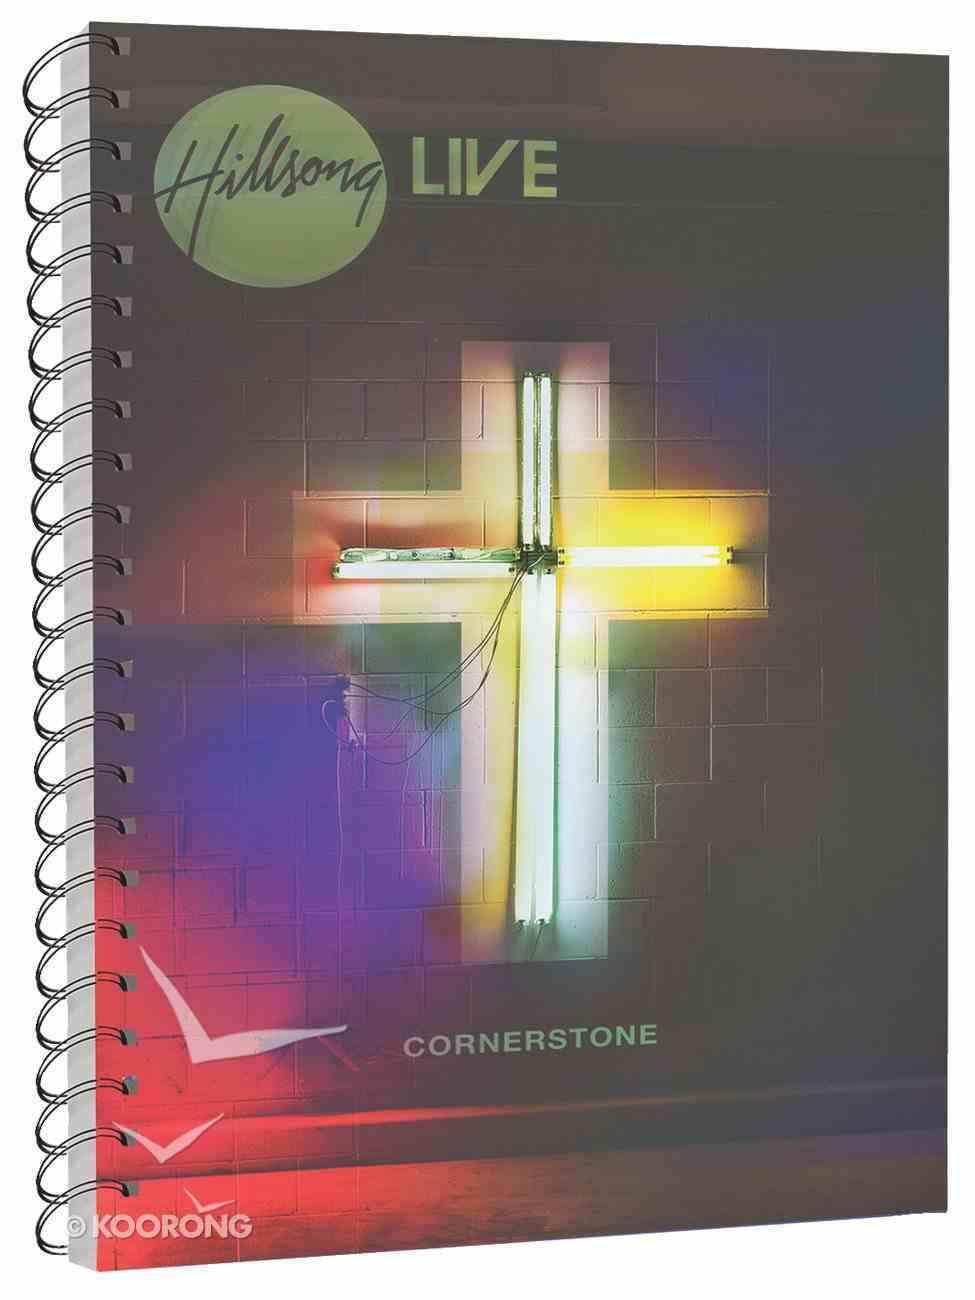 2012 Cornerstone (Music Book) Paperback